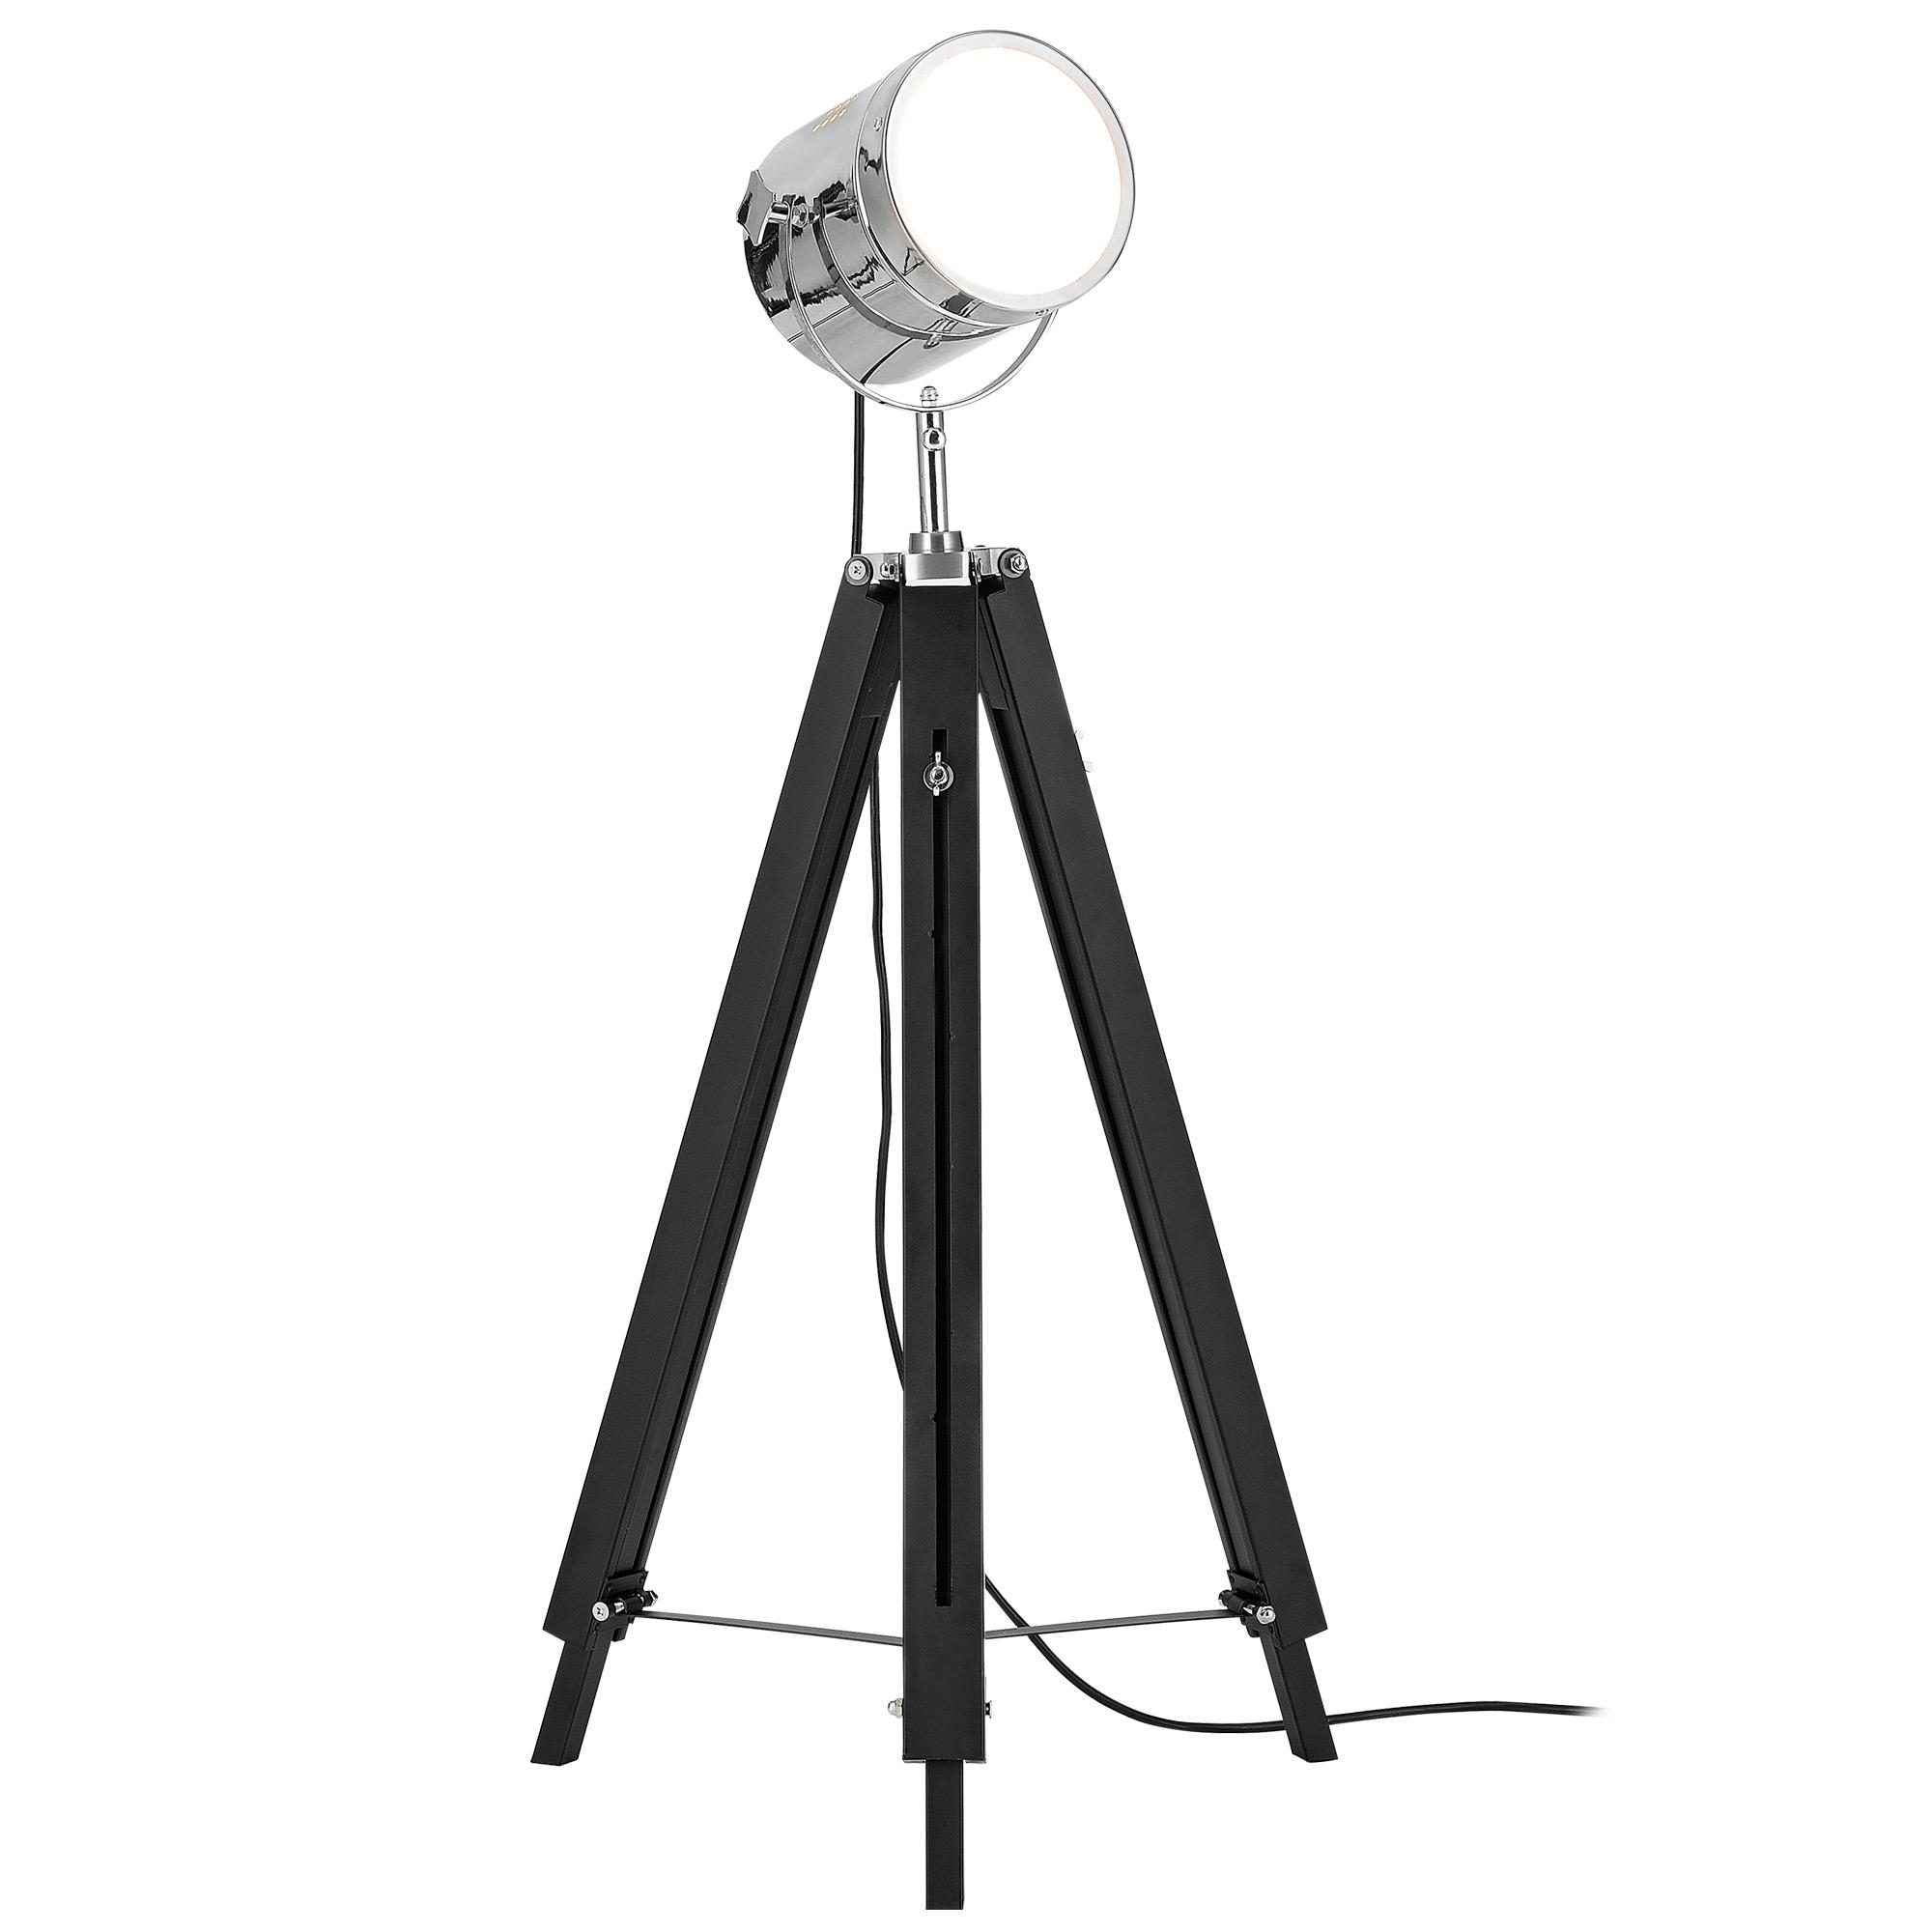 [lux.pro]® Lampa de podea eleganta – Tripod 1 x E 27 – 60W – crom / negru